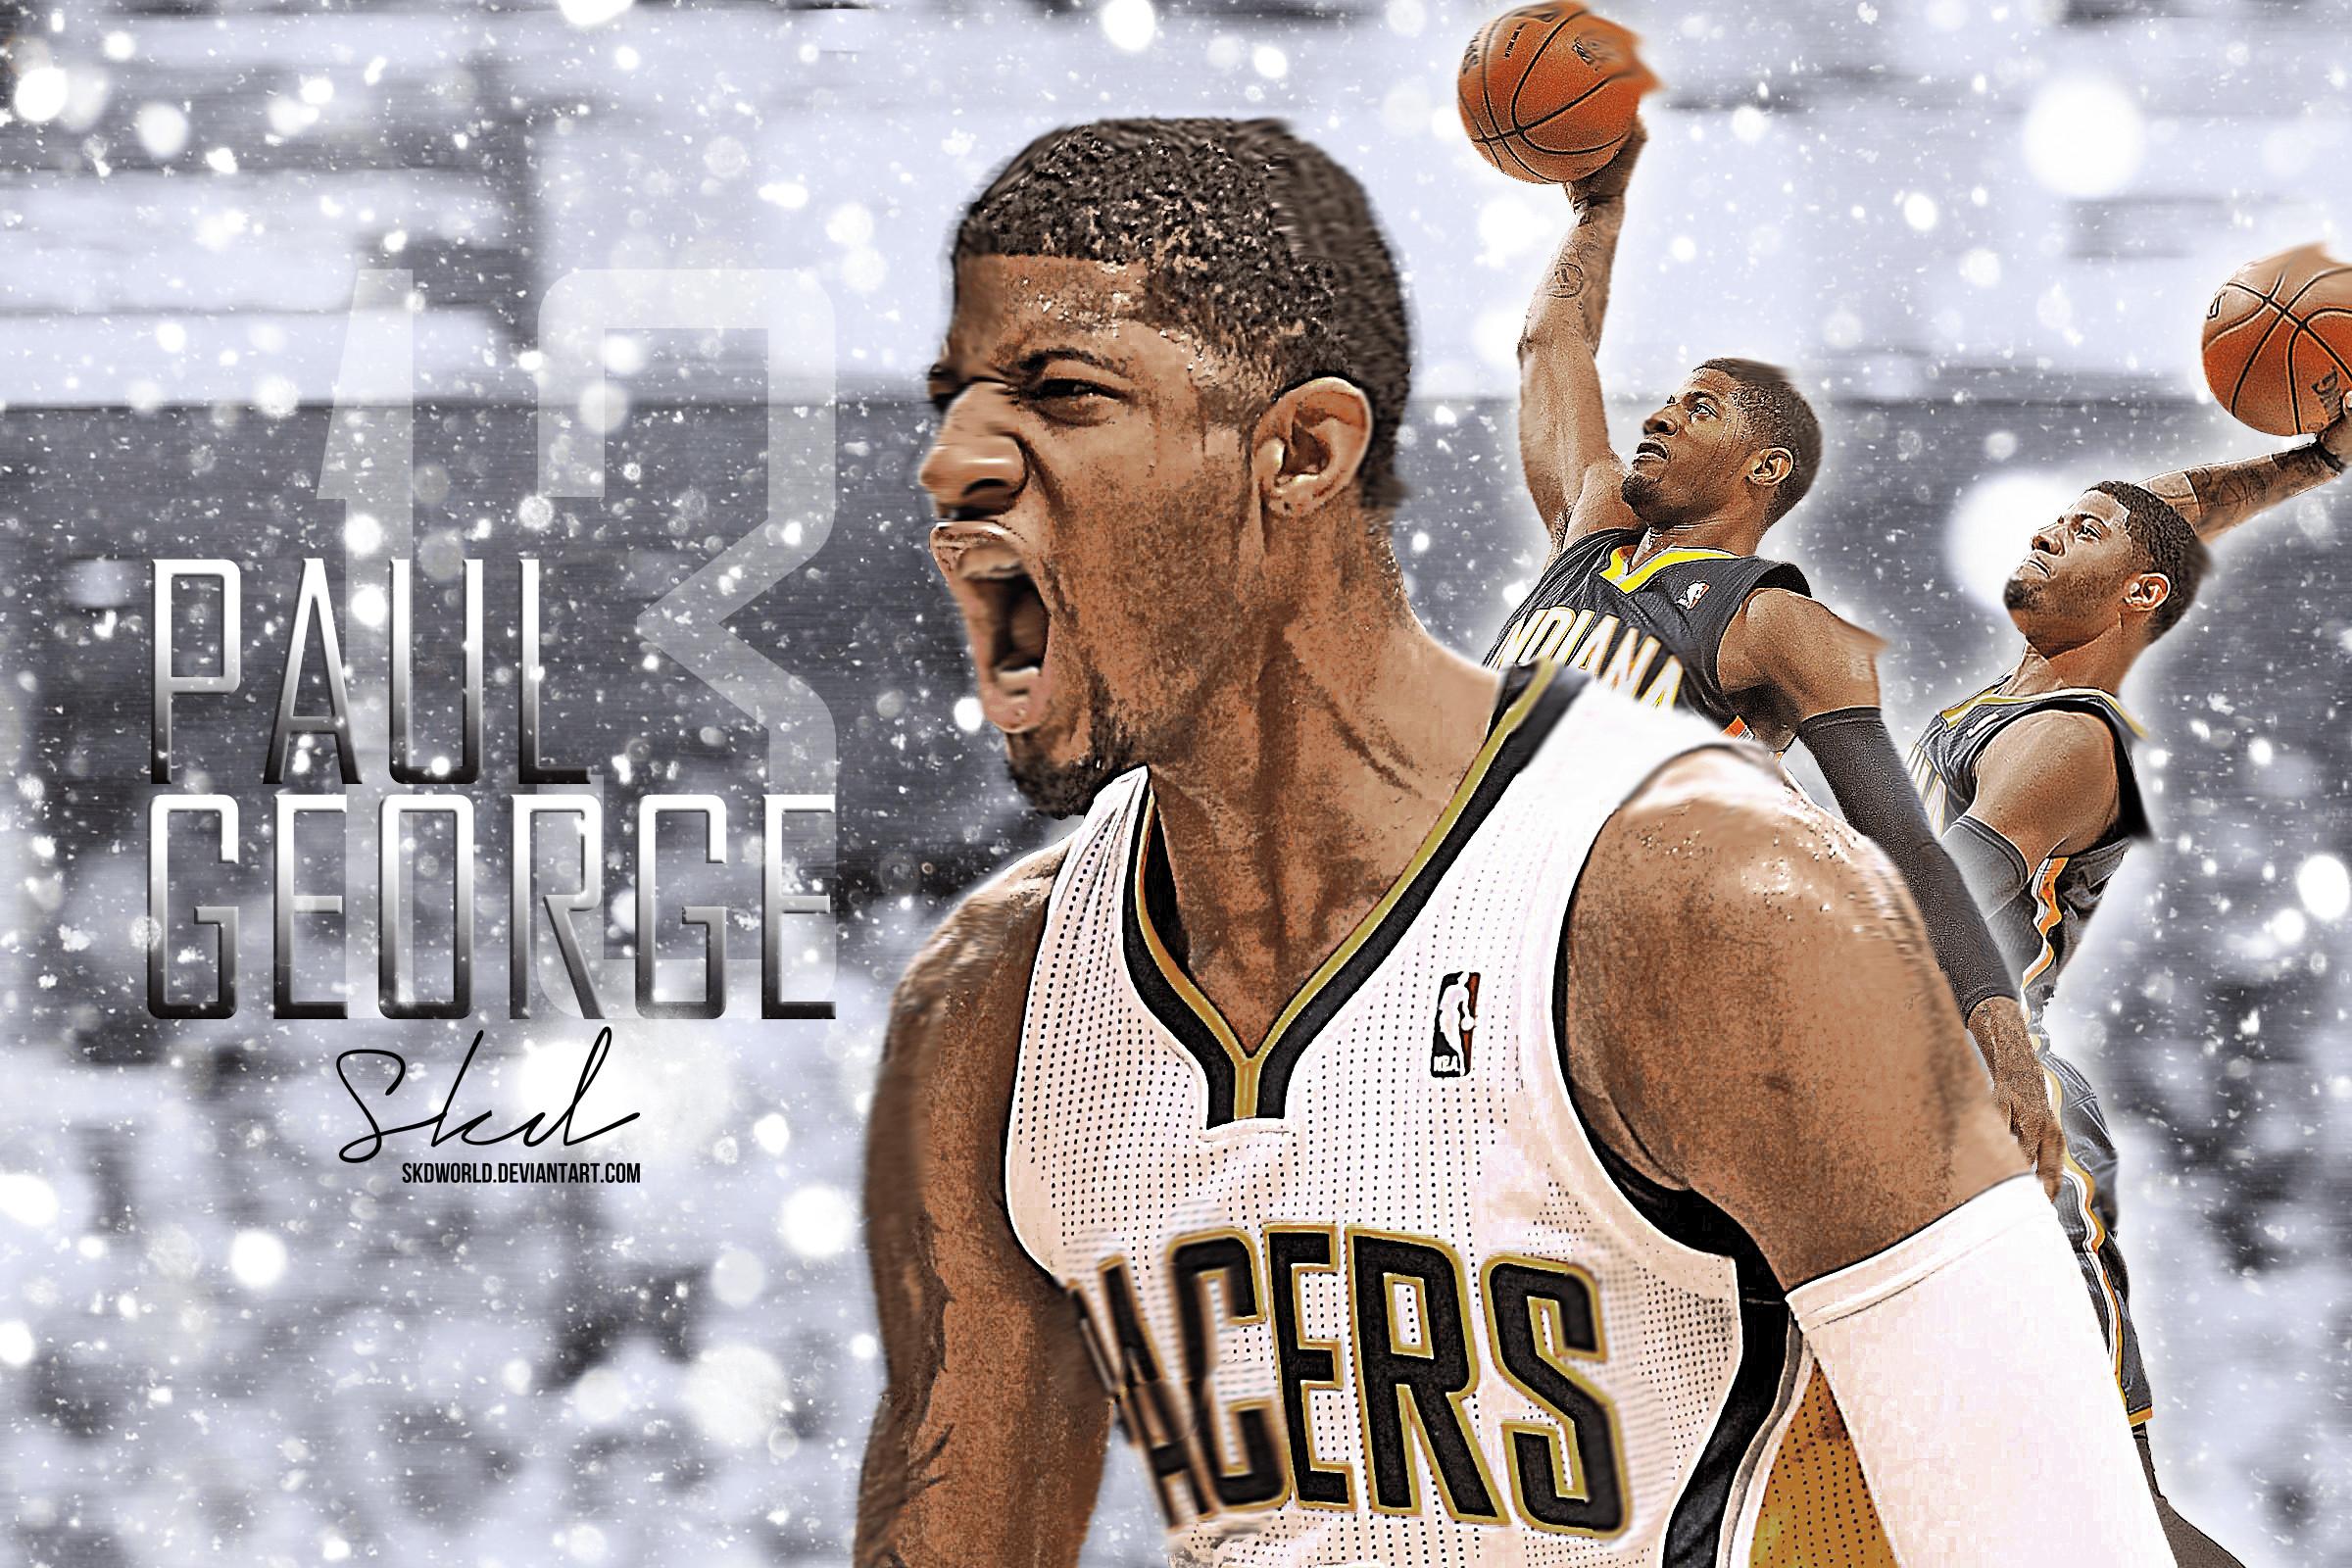 NBA <b>Wallpapers</b> | HDFX CREATIVE